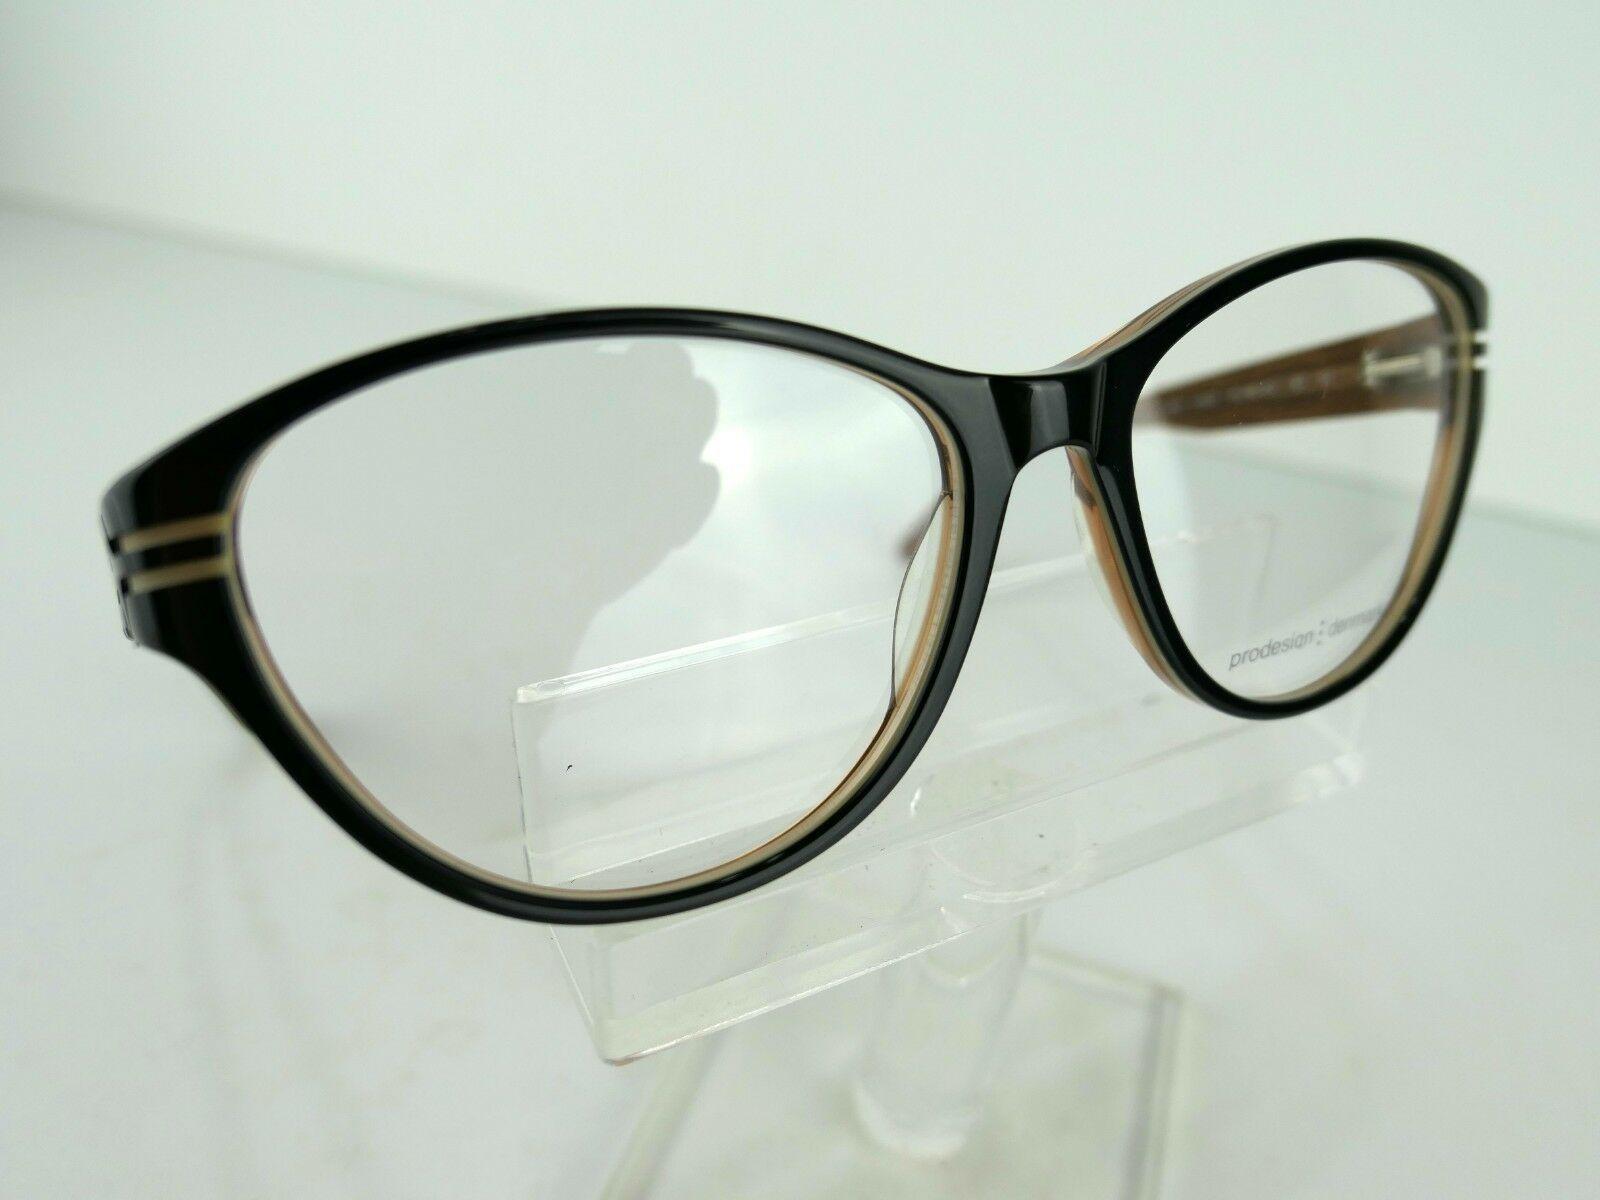 PRODESIGN DENMARK 1696 (6022) Black Shiny 55  x 16  Eyeglass Frames